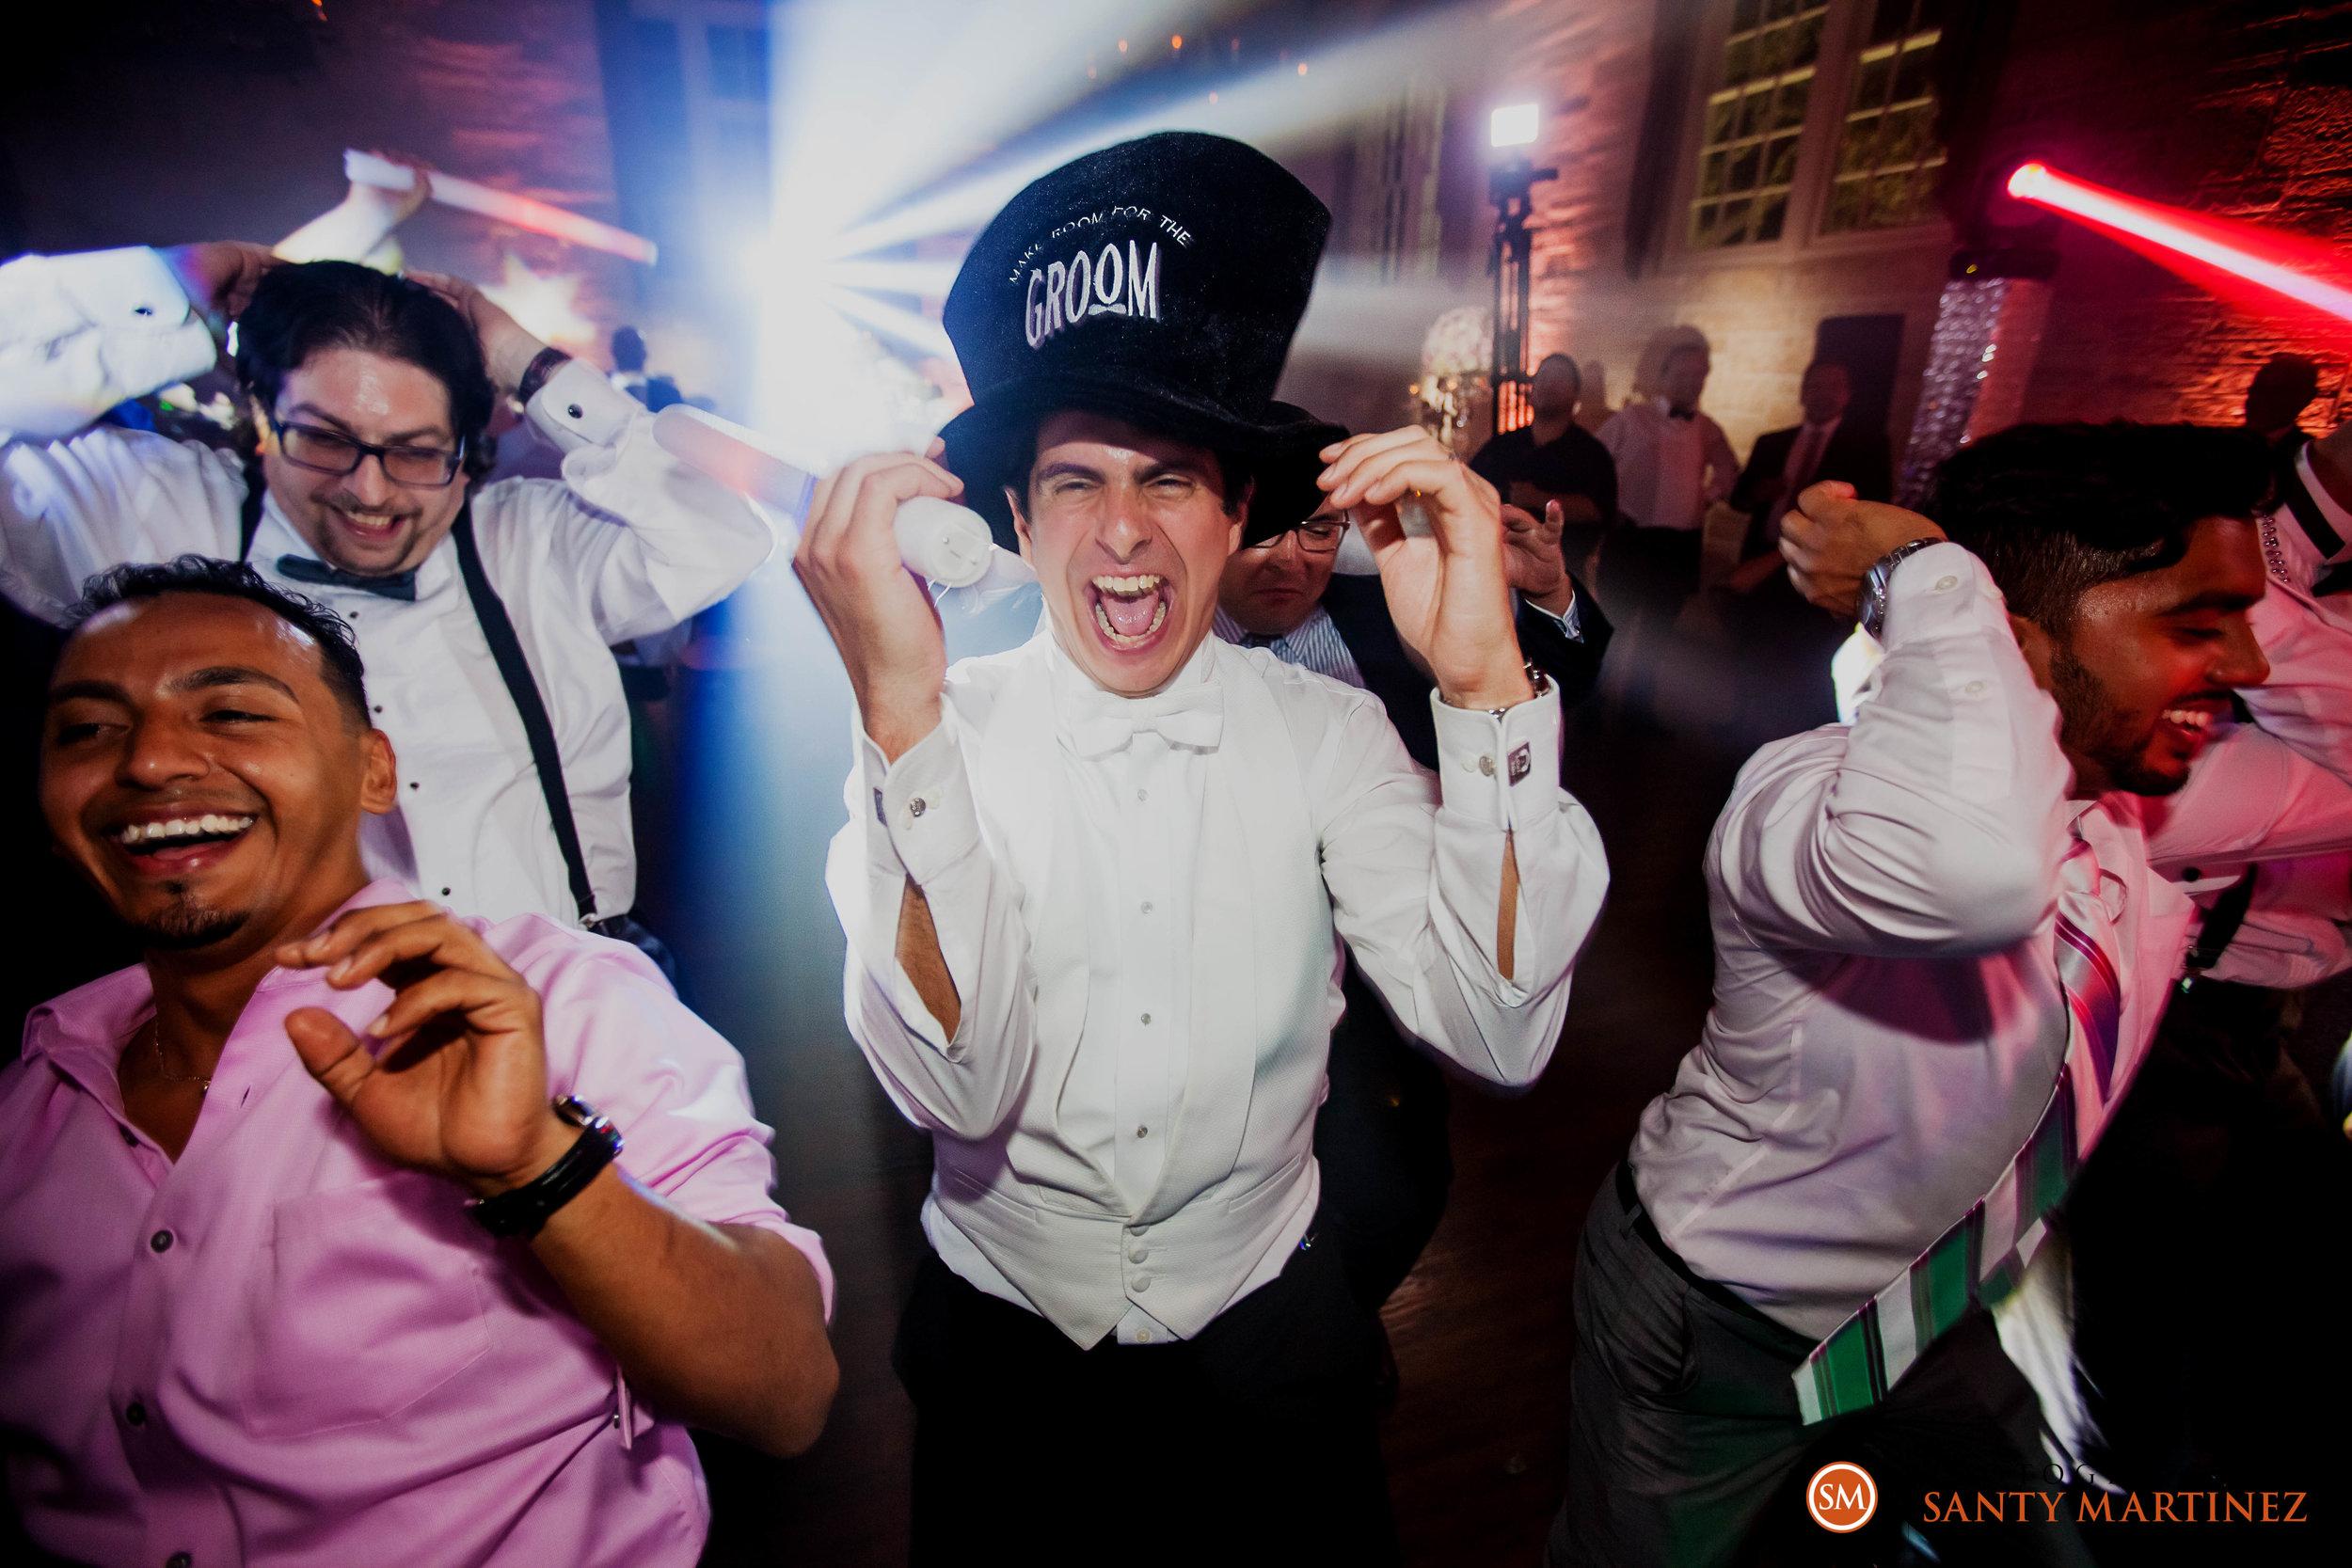 Miami Wedding Photographer - Santy Martinez-46.jpg